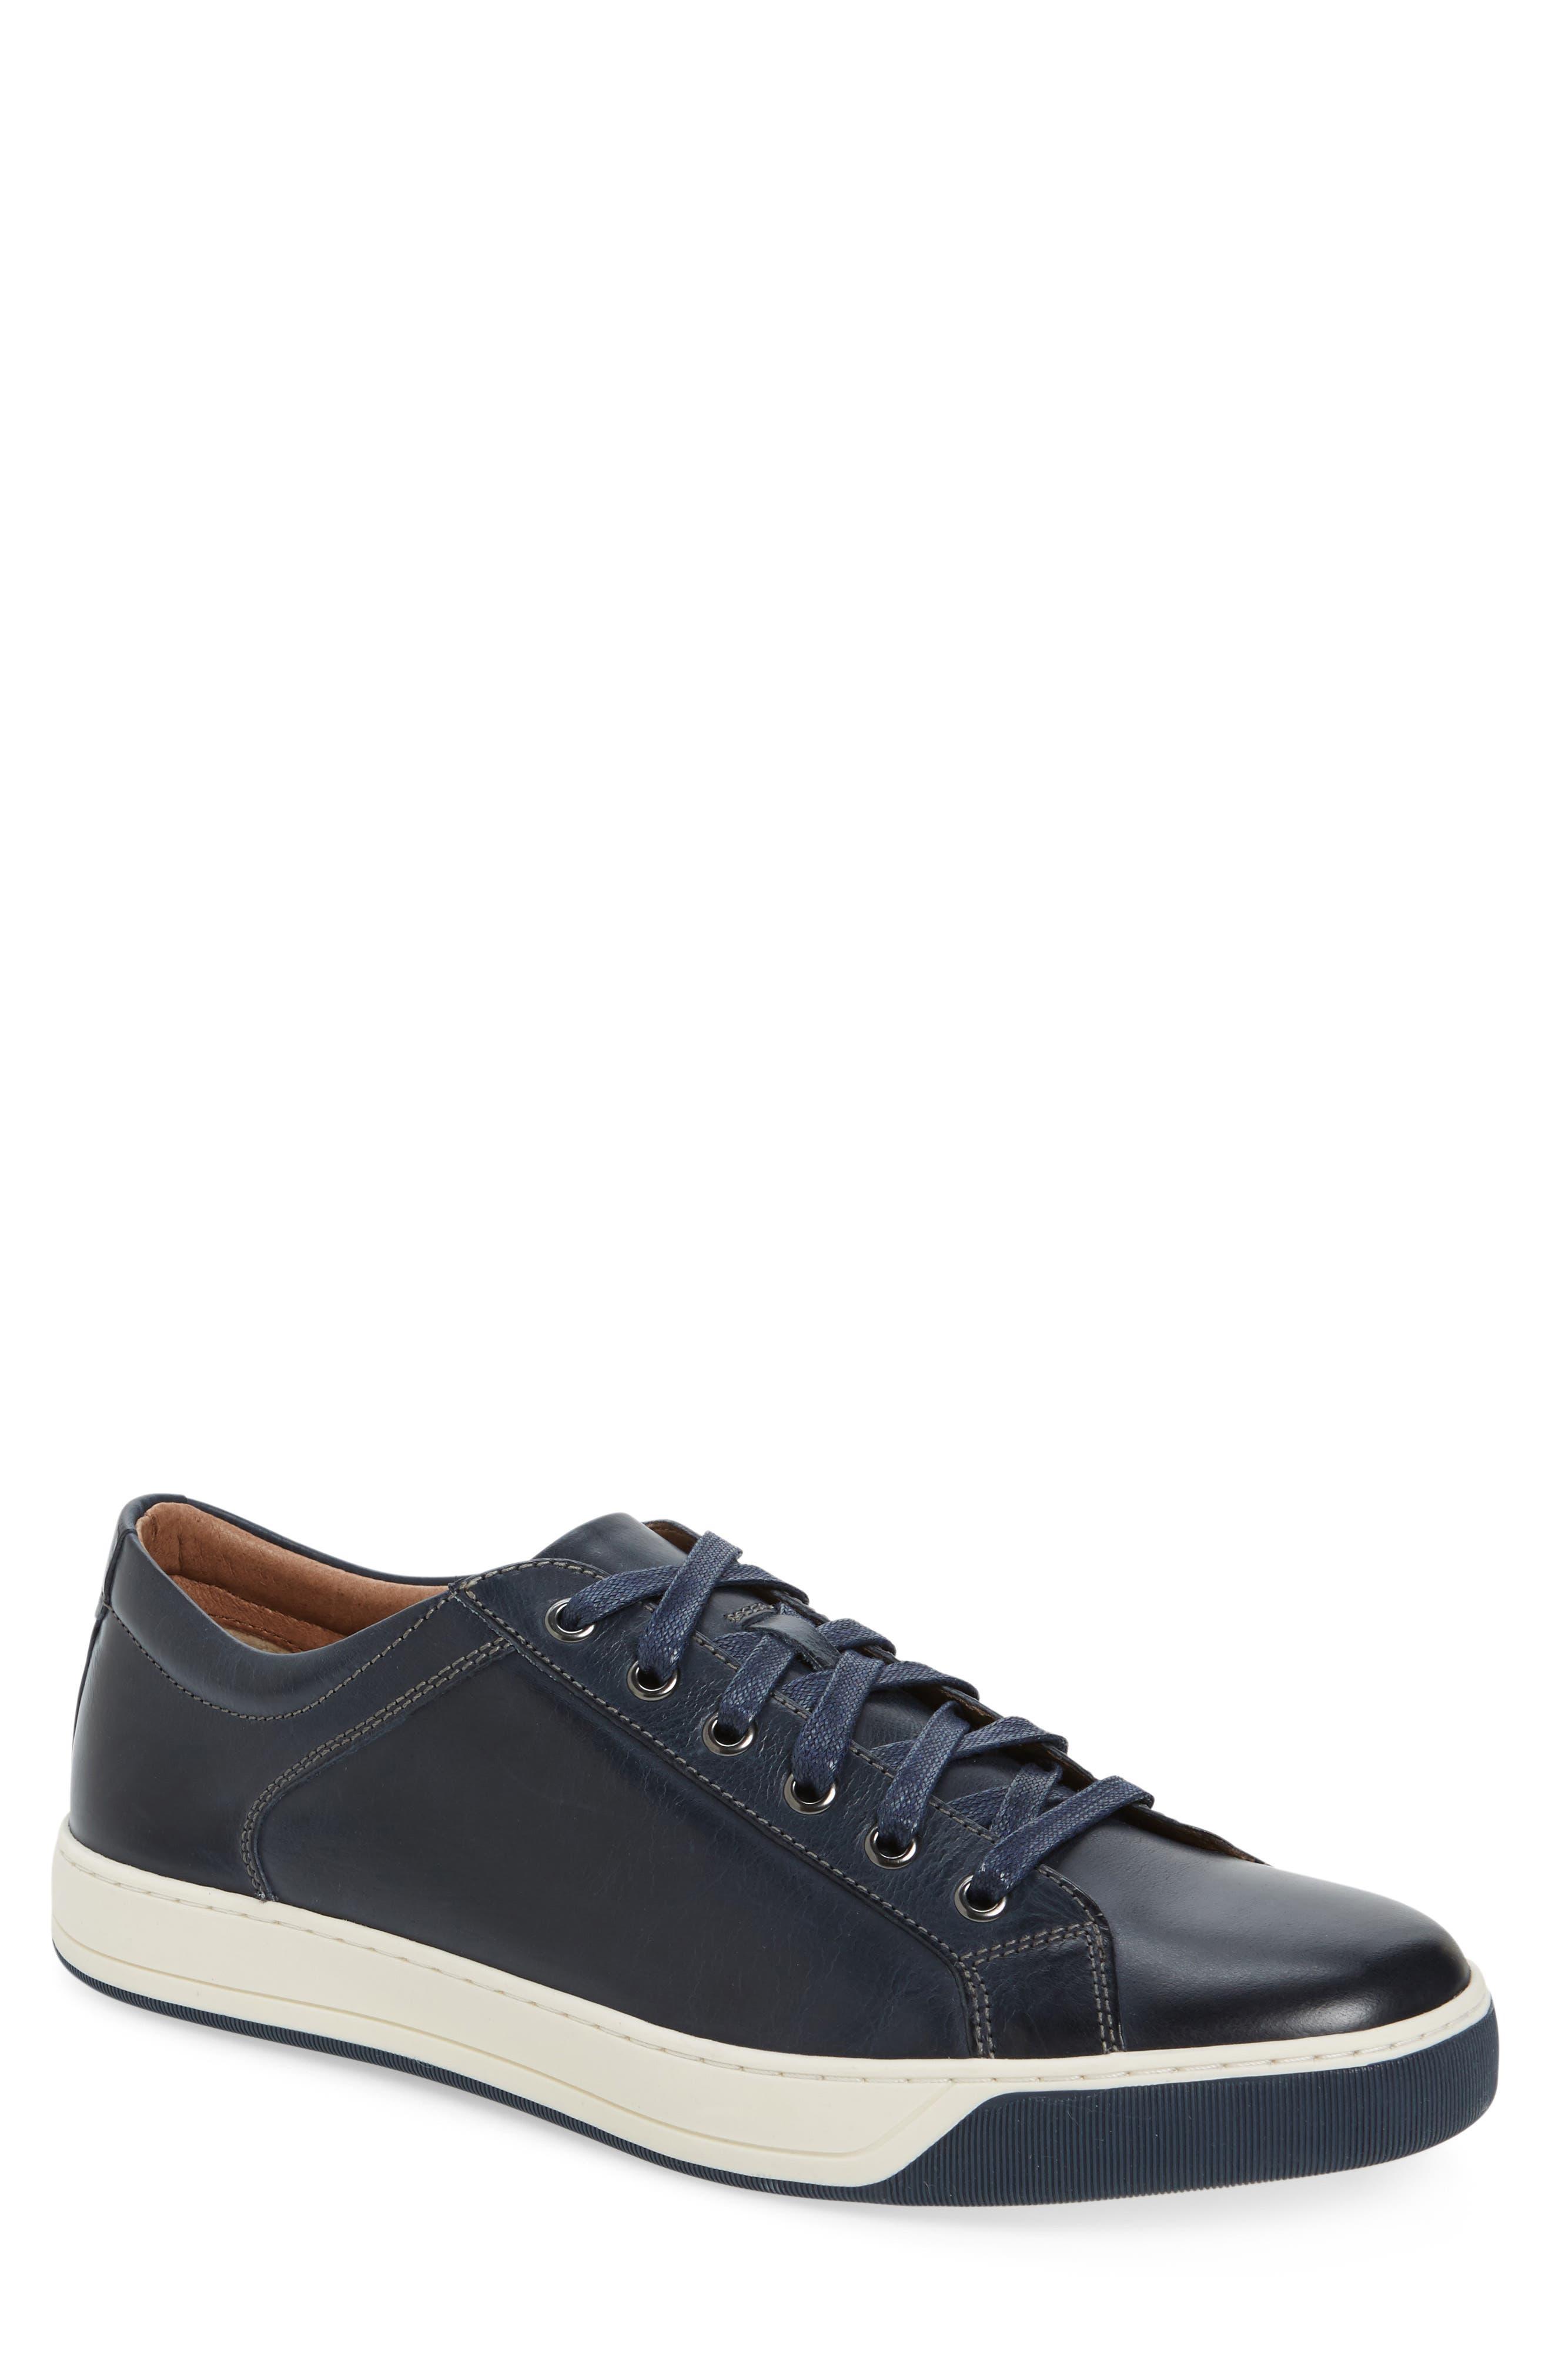 J&M 1850 Allister Sneaker, Main, color, NAVY/ NAVY LEATHER